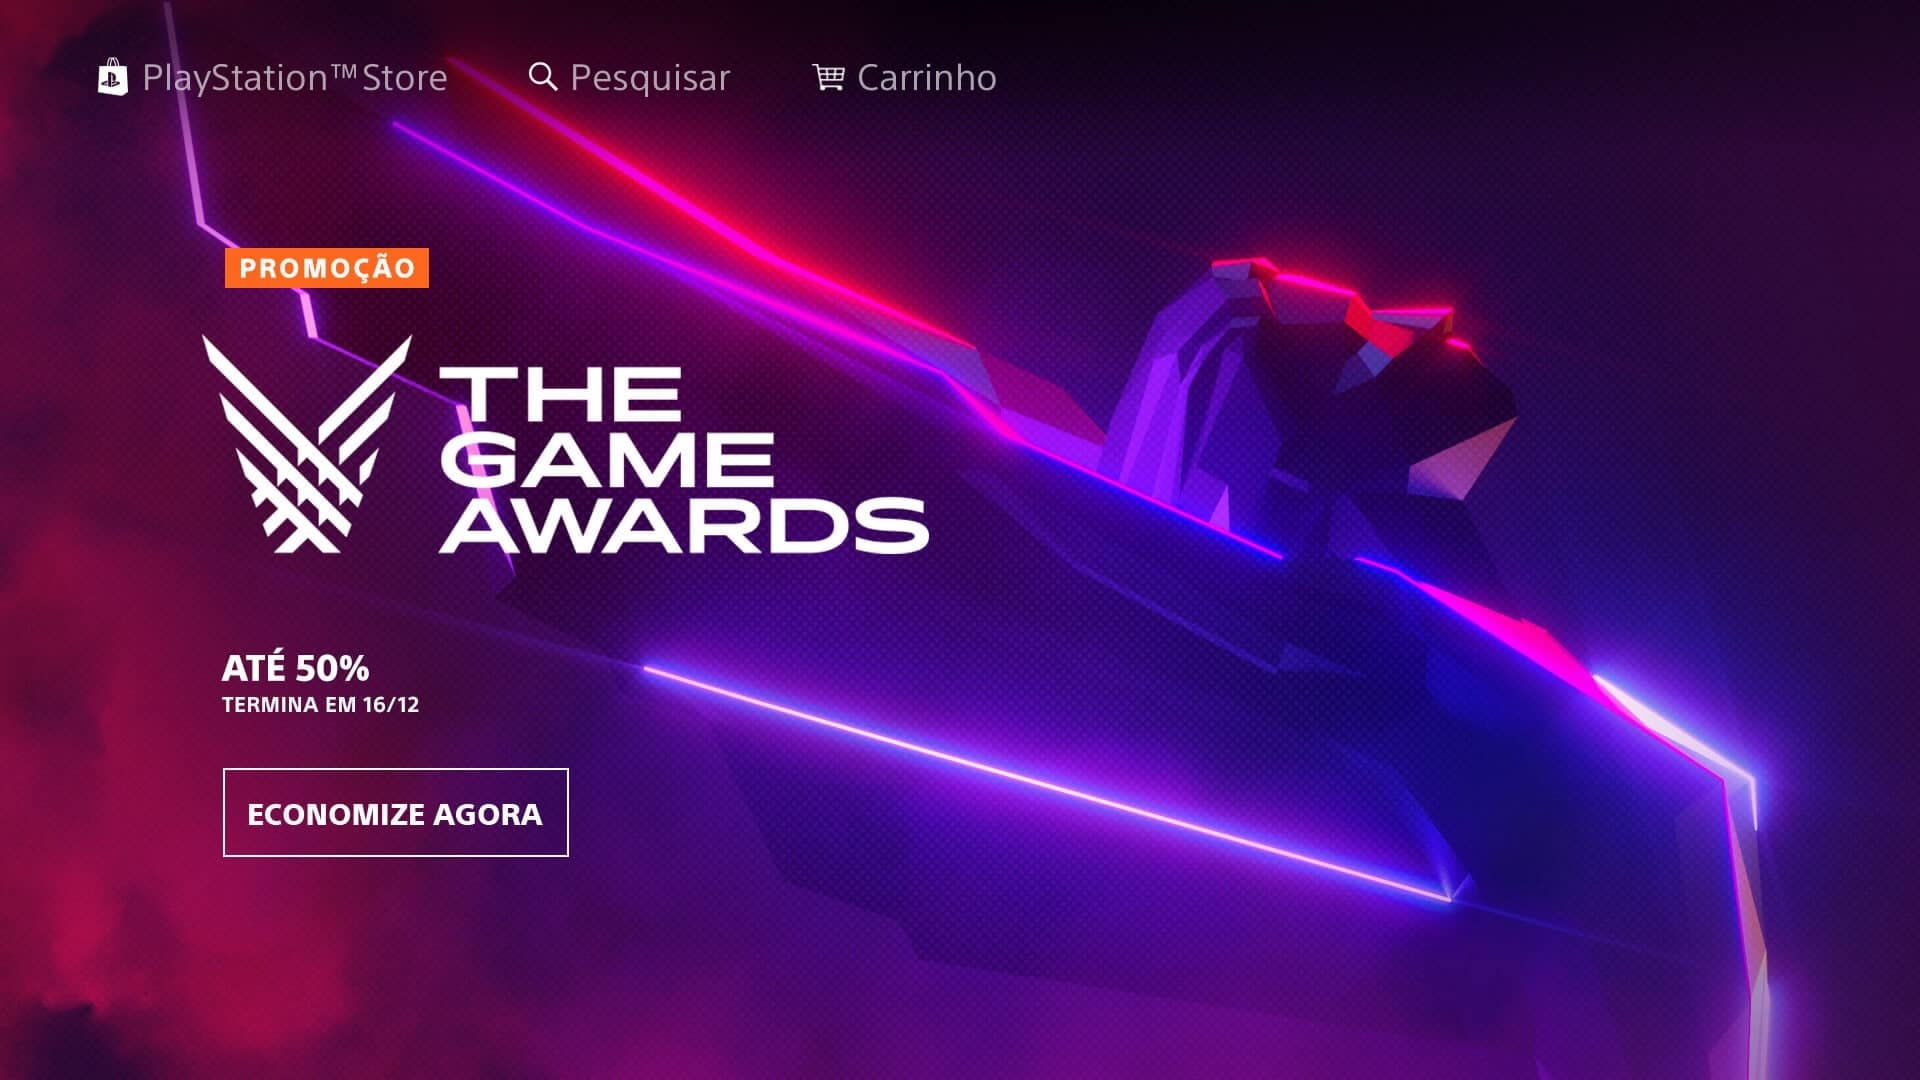 Confira a lista com todos os vencedores do The Game Awards 2019